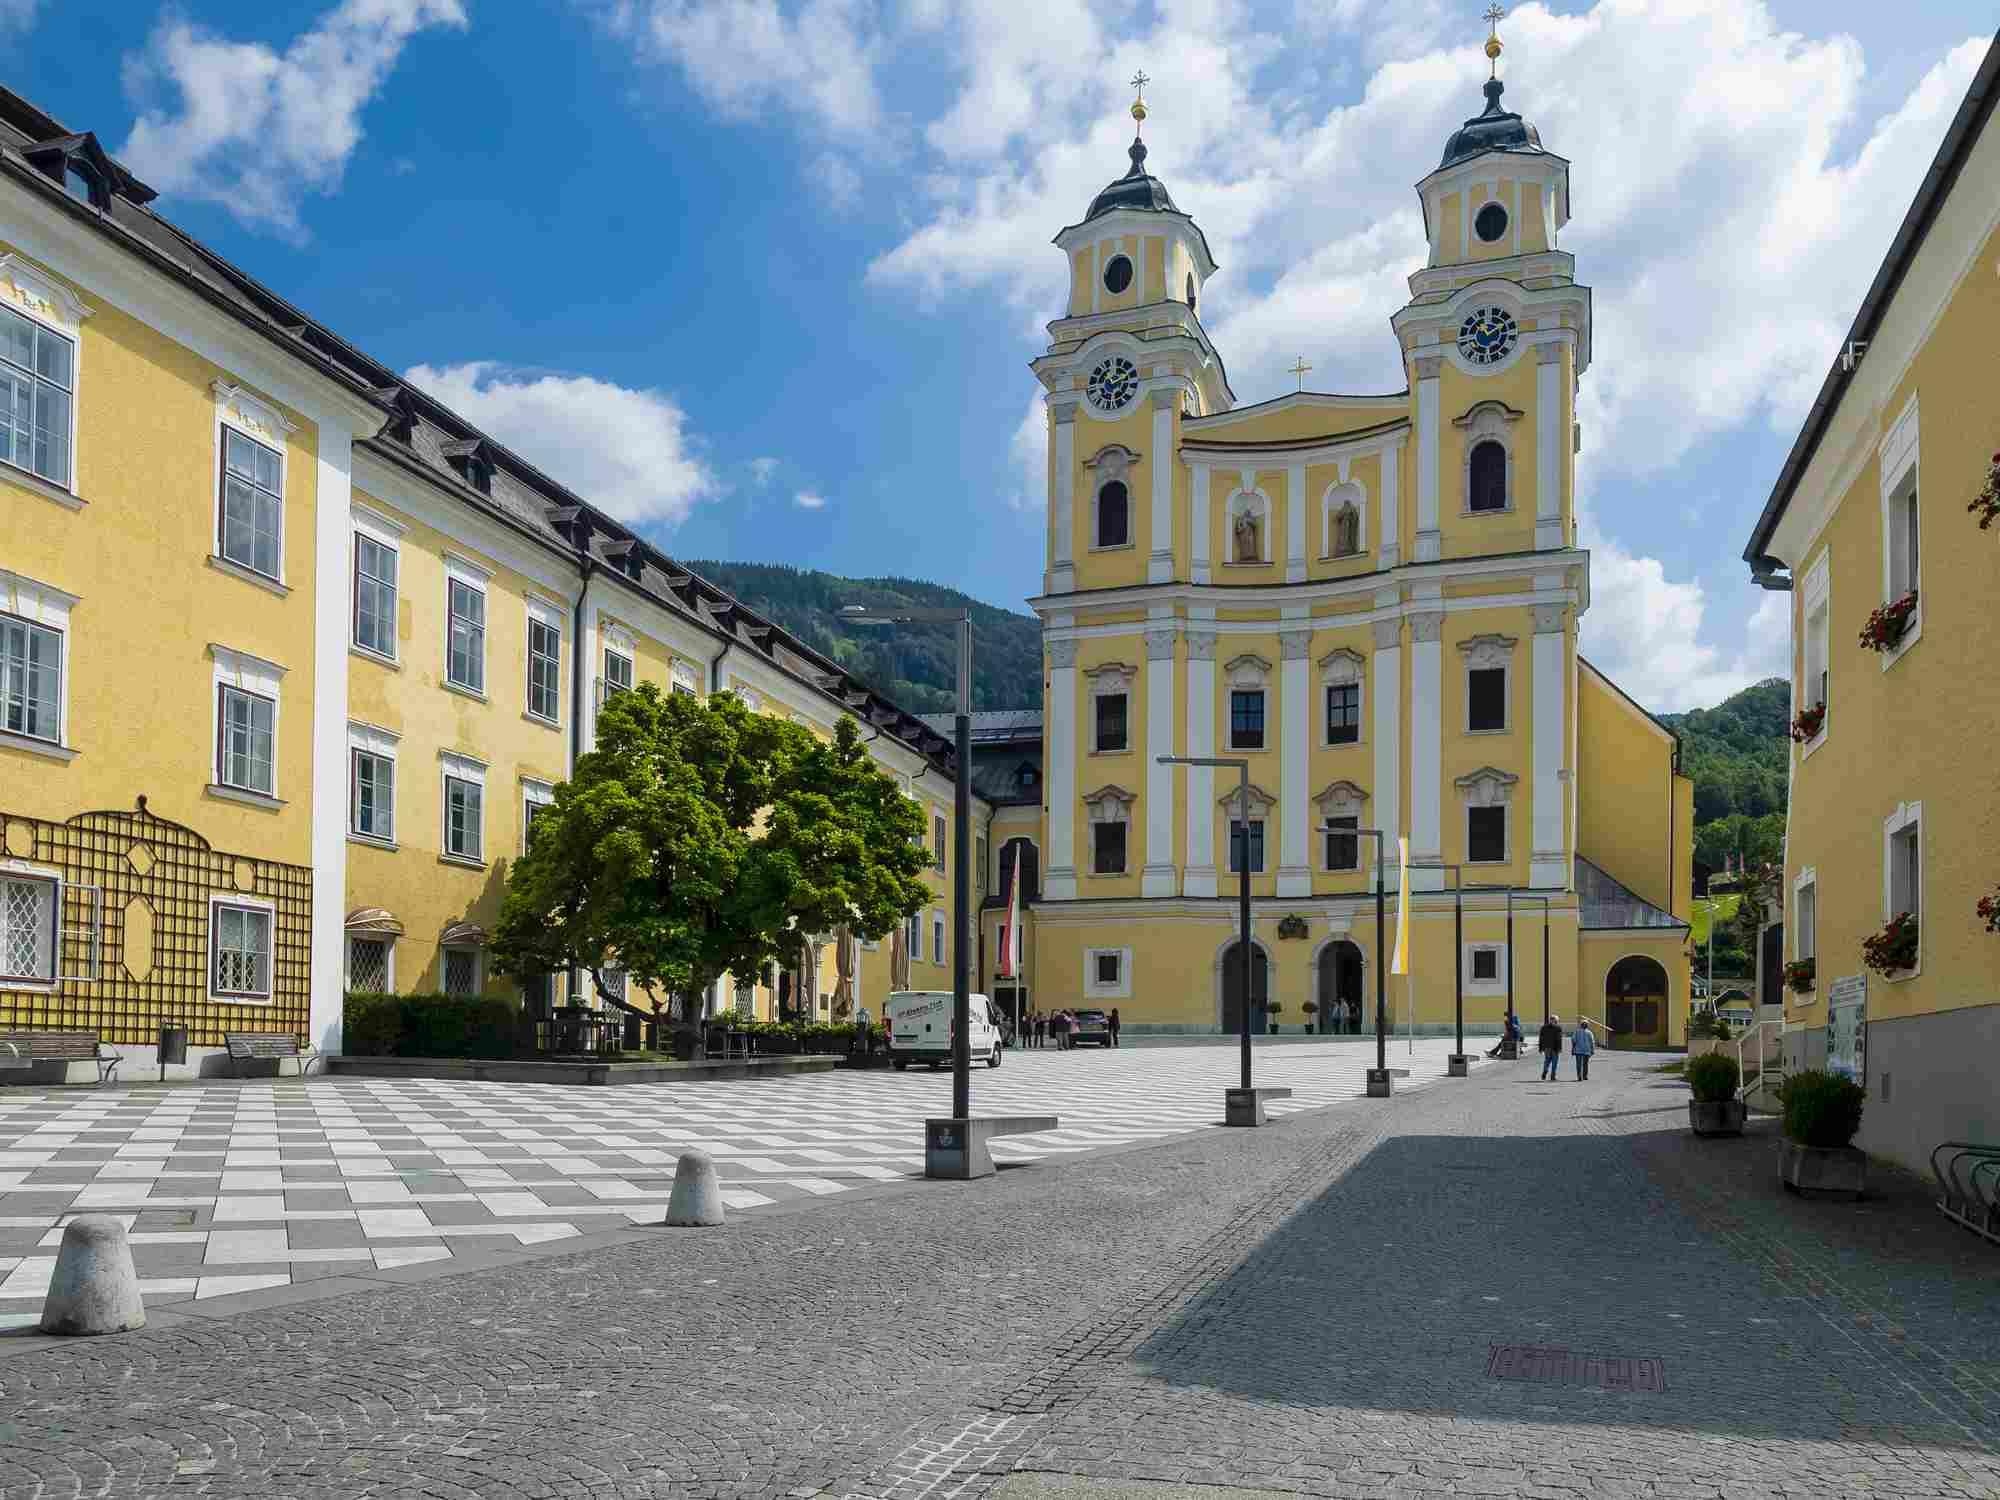 St. Michaels Basilica, Mondsee Austria